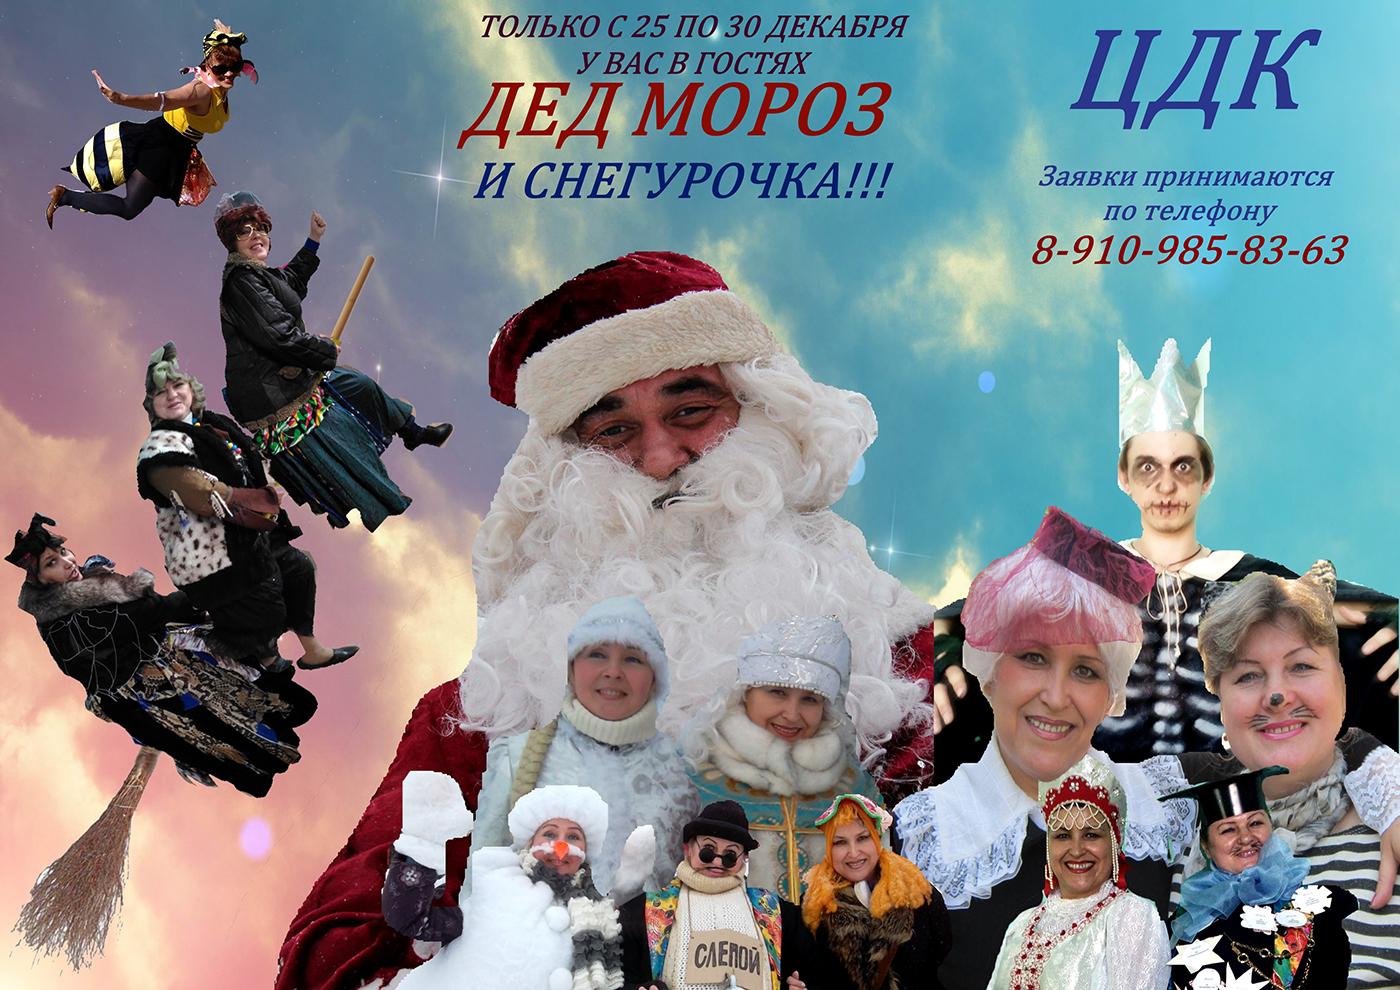 реклама-25-30-декабря2015